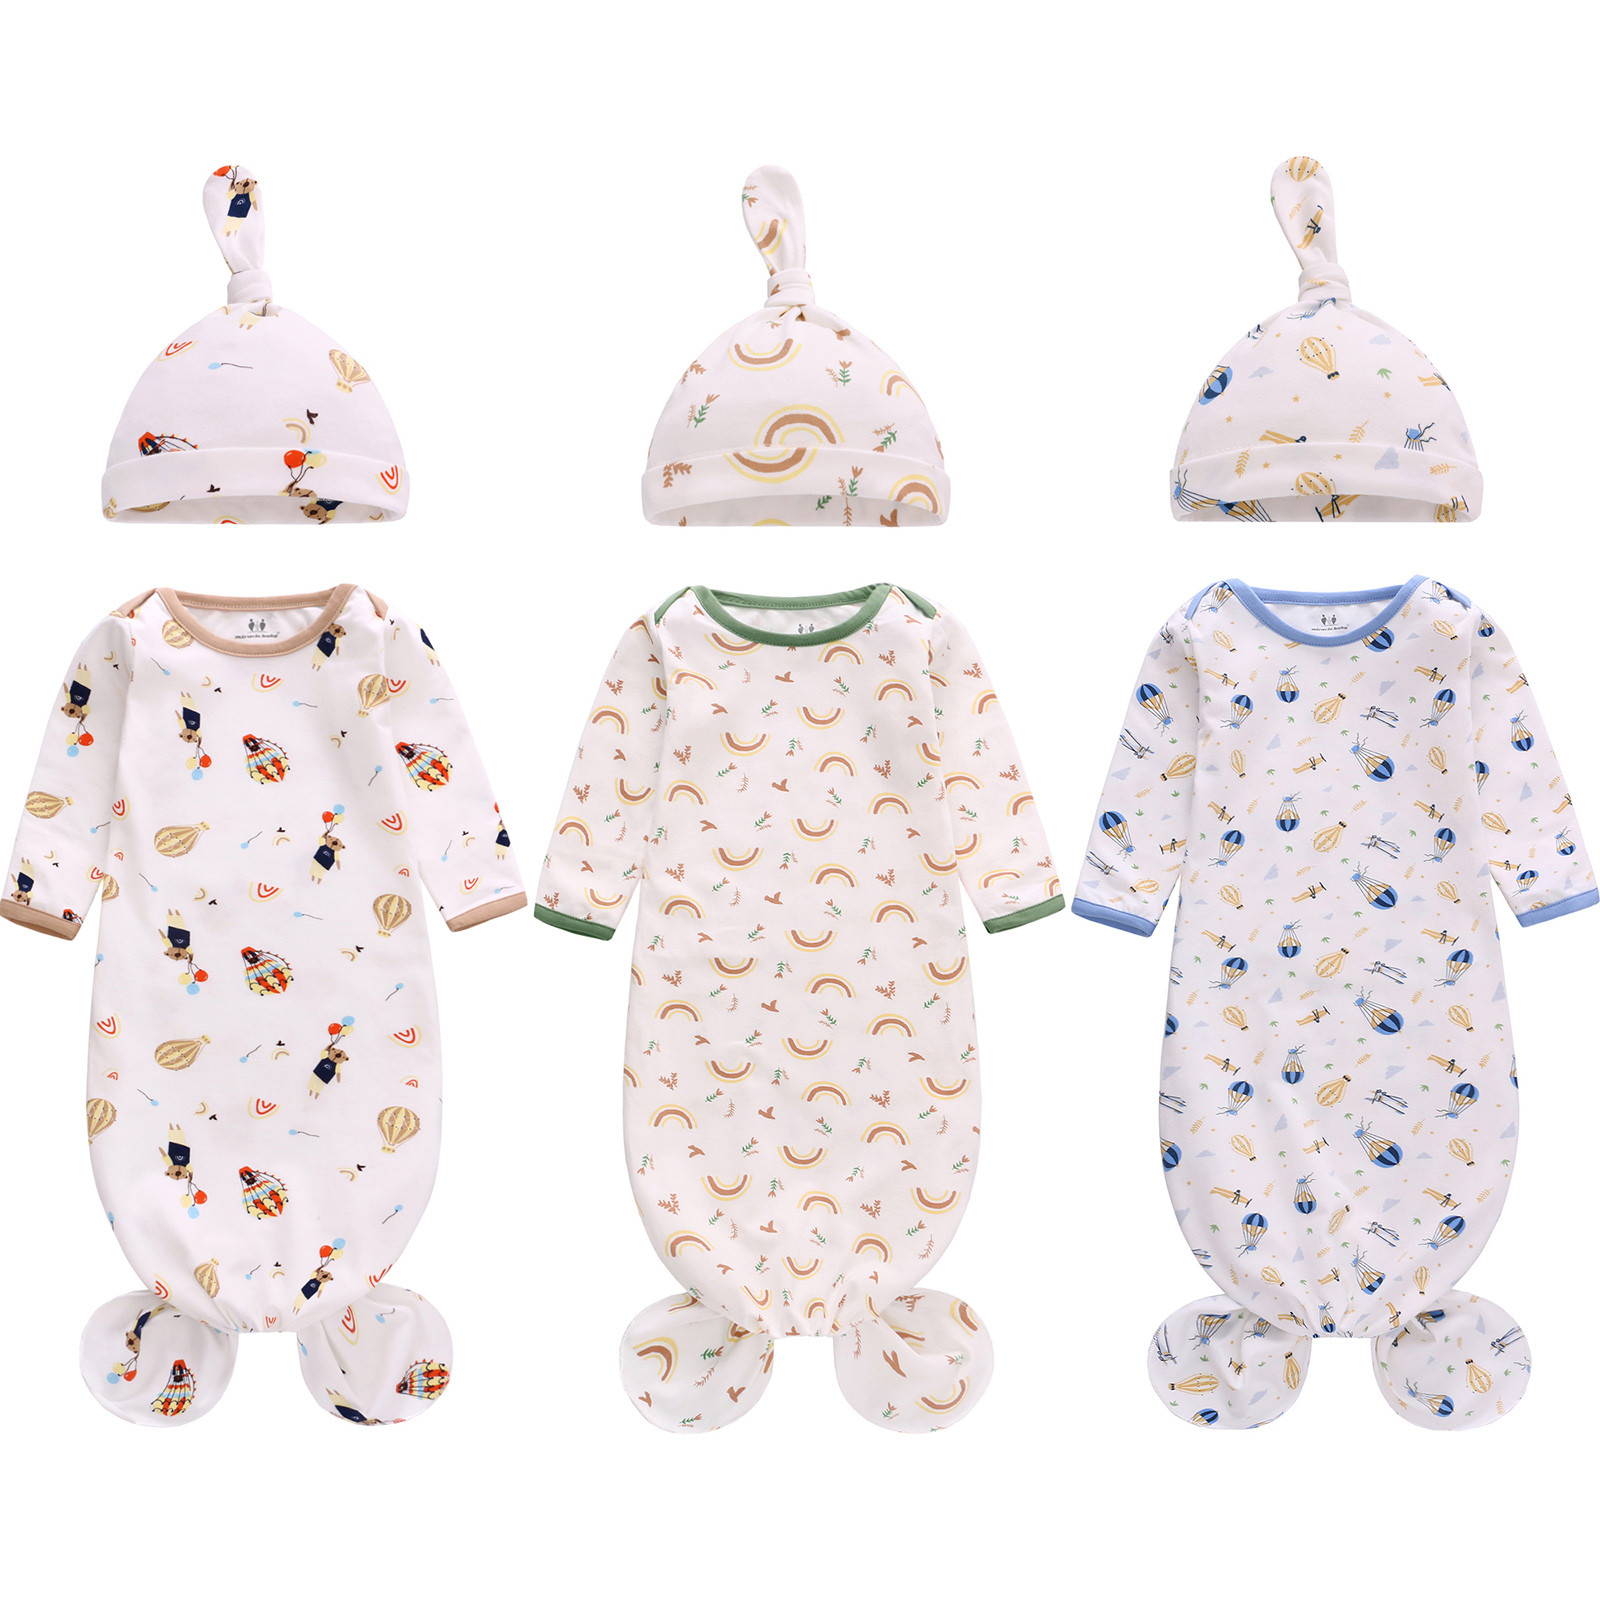 2PC Set Newborn Baby Long-Sleeved Wrapper Baby Bear Balloon Anti-Starter Anti-Kick Sleeping Bag Swaddling Quilt Hat Baby Clothes